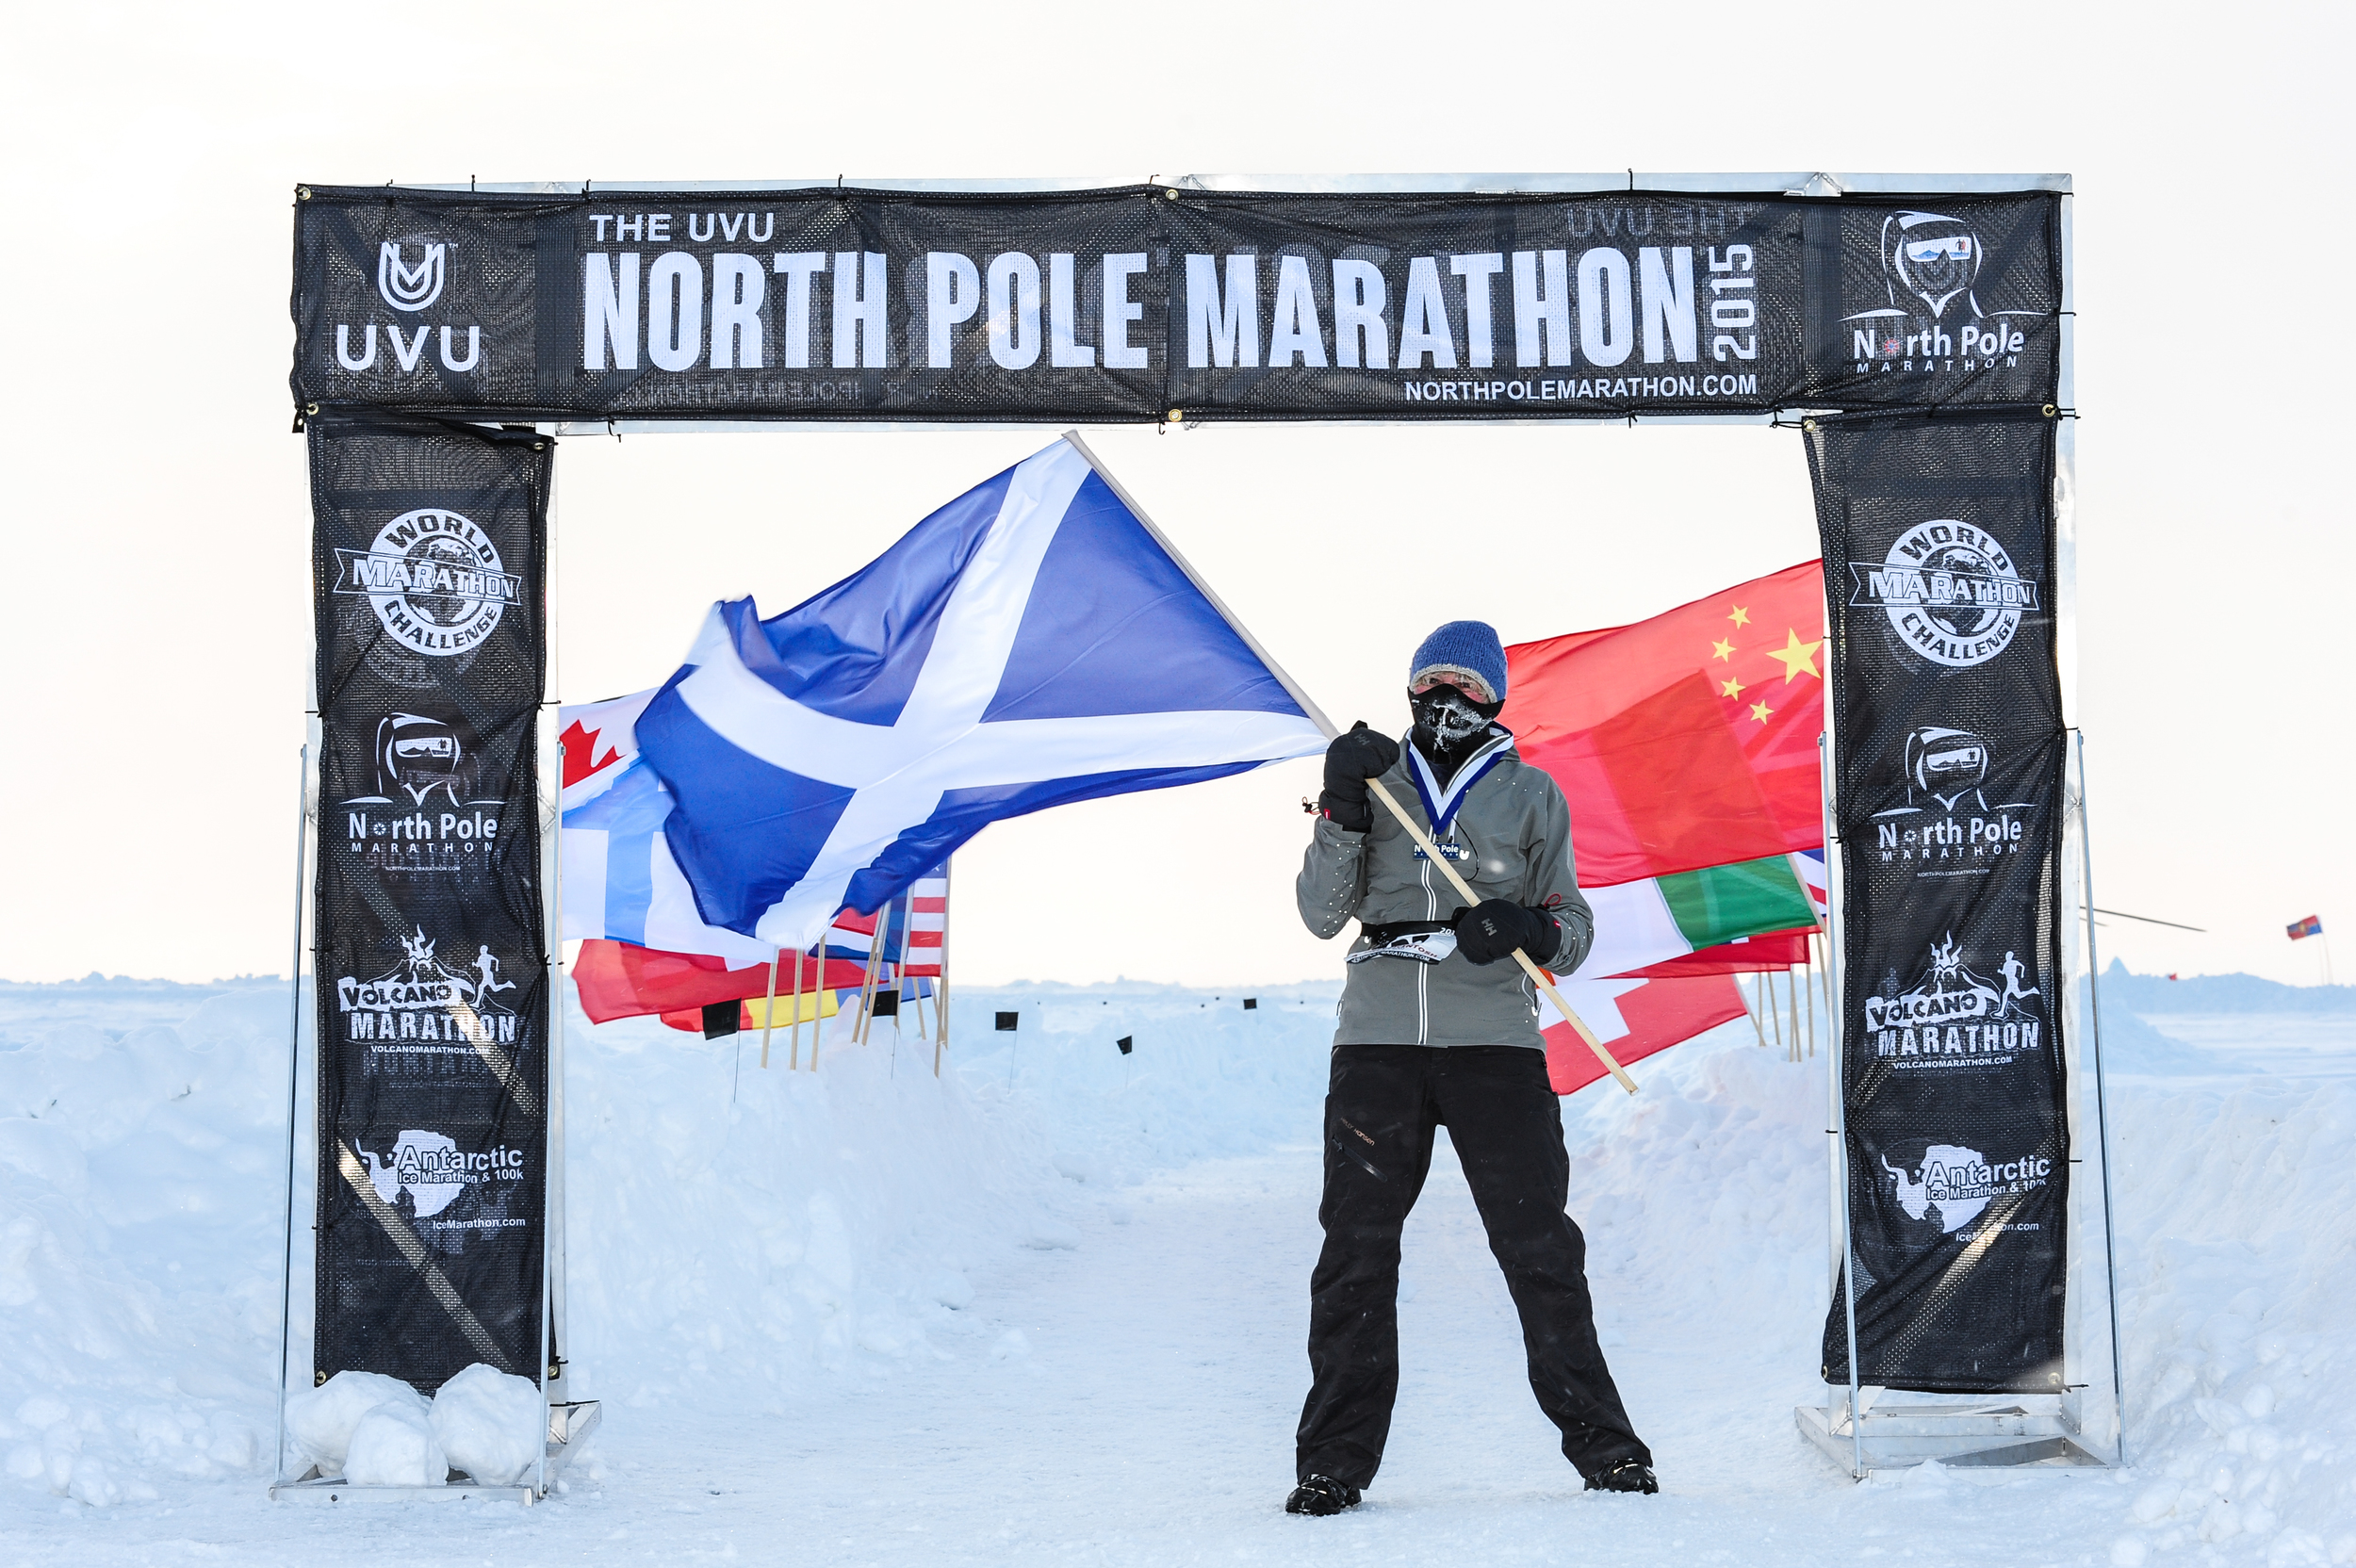 North Pole Marathon Finish Line: photo Mark Conlon copyright  www.npmarathon.com